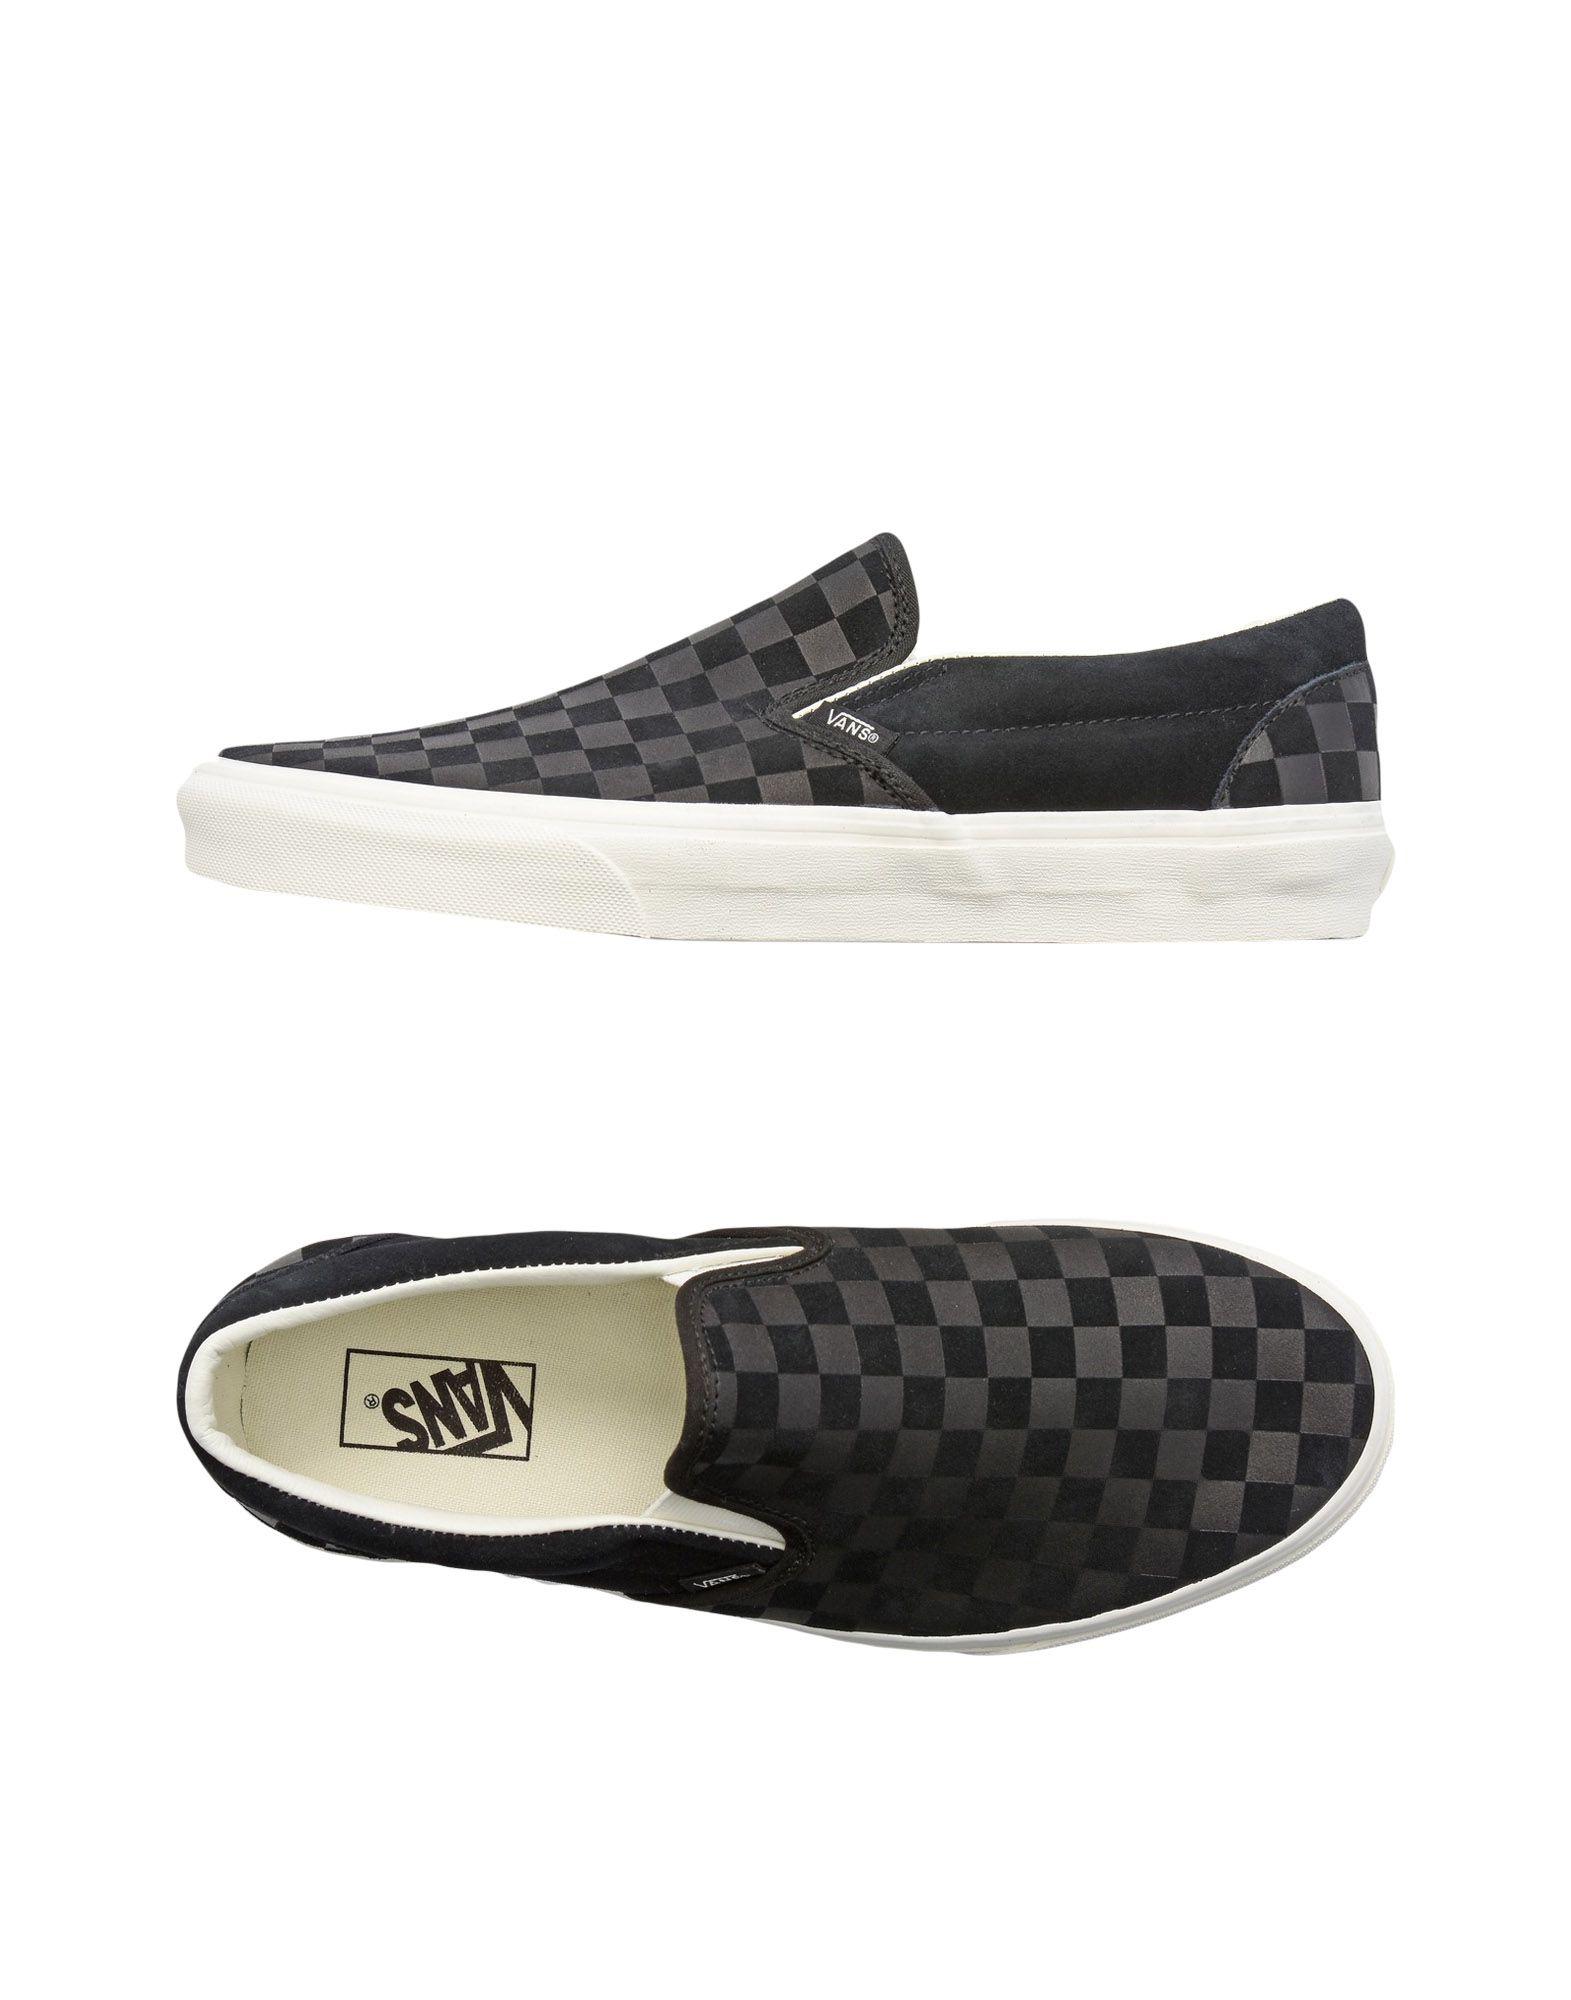 Zapatillas Vans Ua Classic Slip-On - Hombre - Zapatillas Vans   Vans Negro ac7553